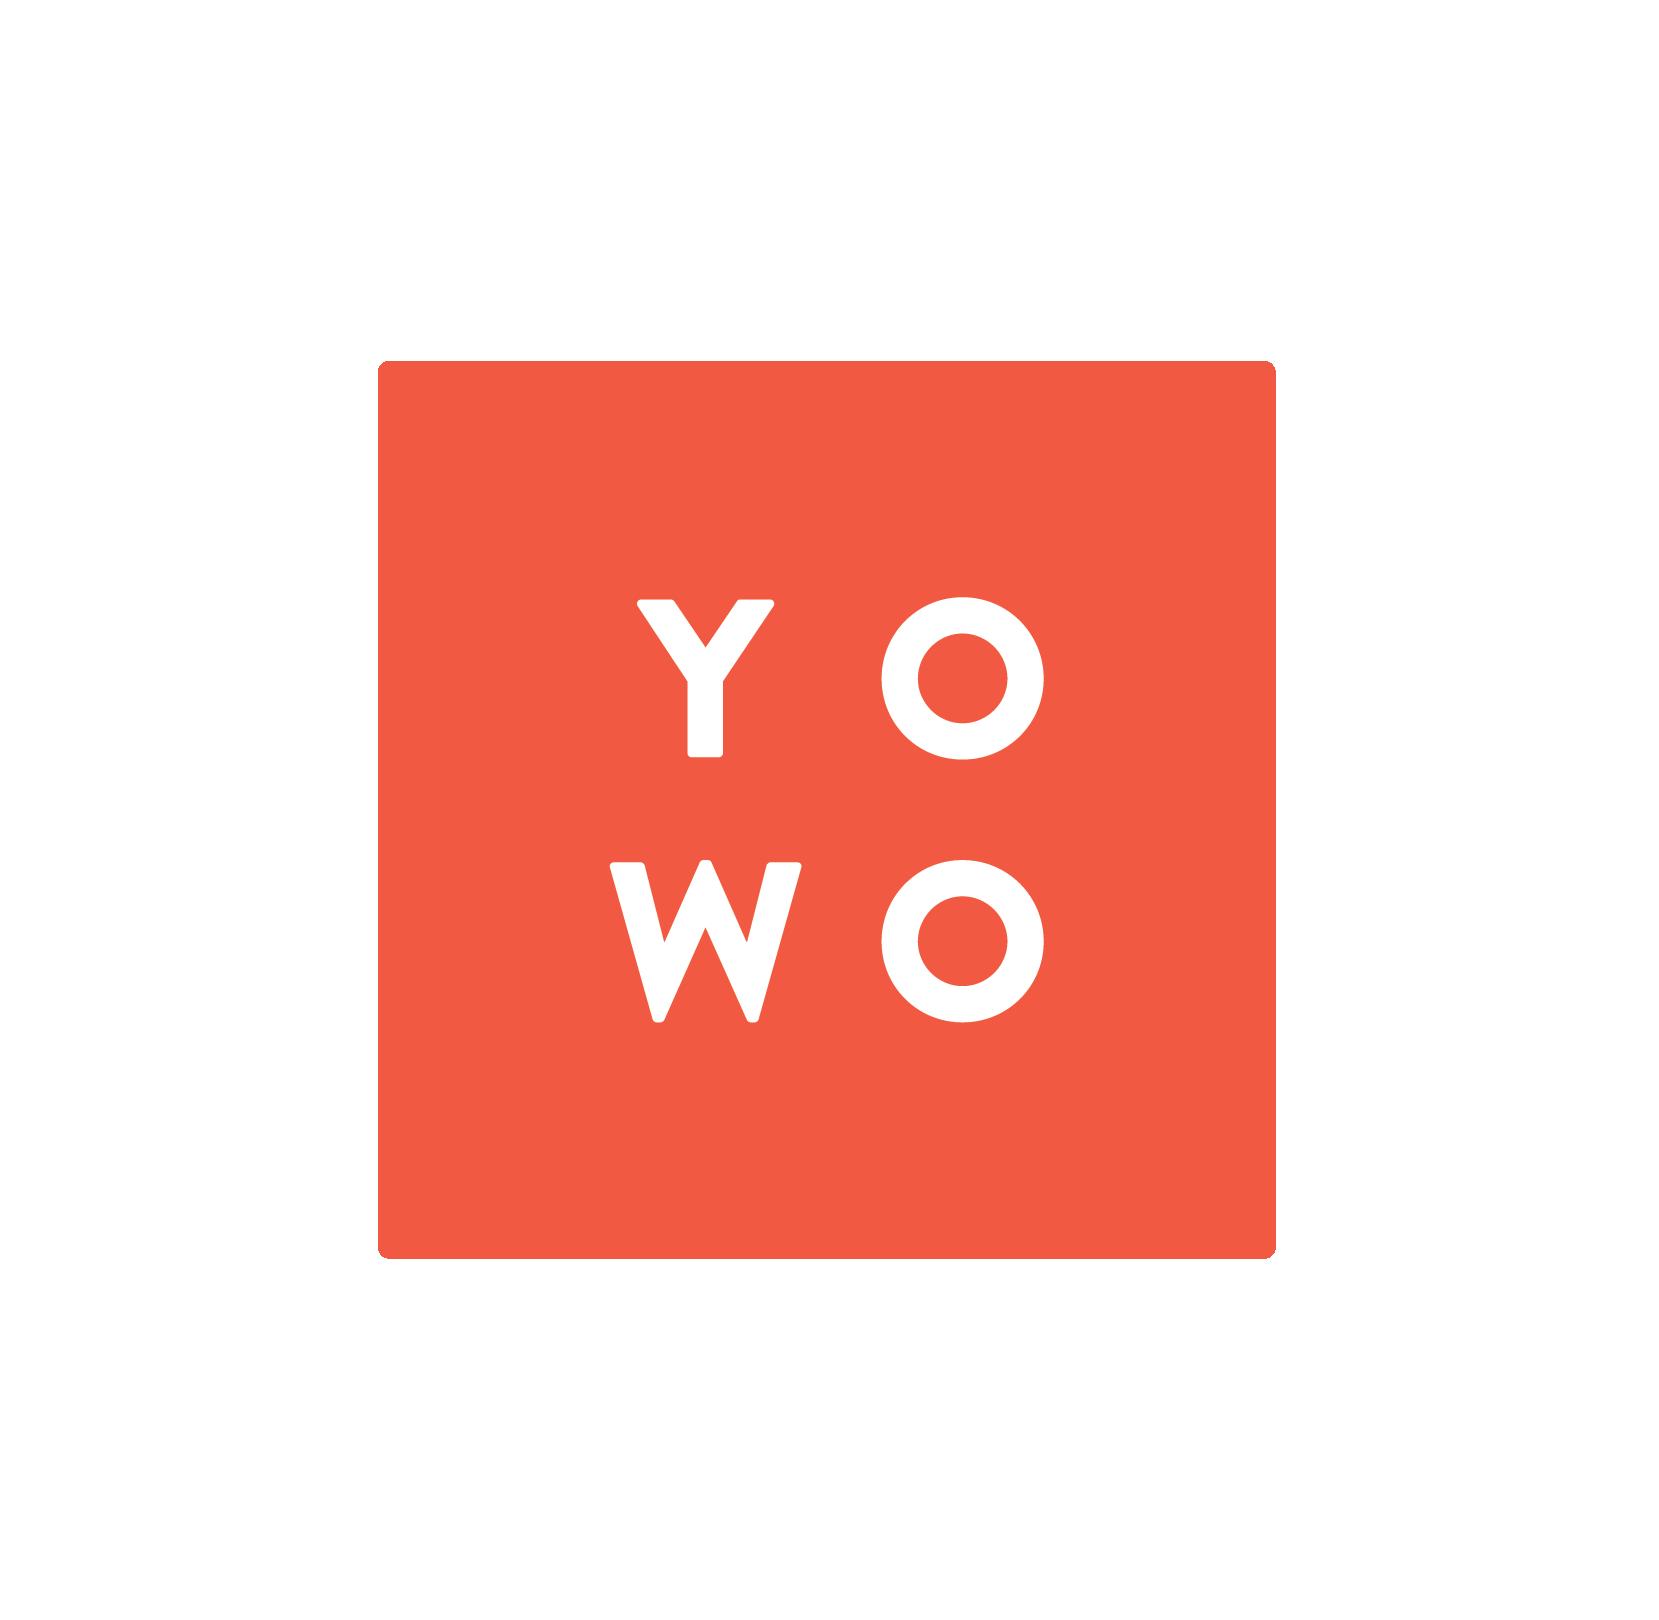 YOWO-Logos-Master_FA-07.png